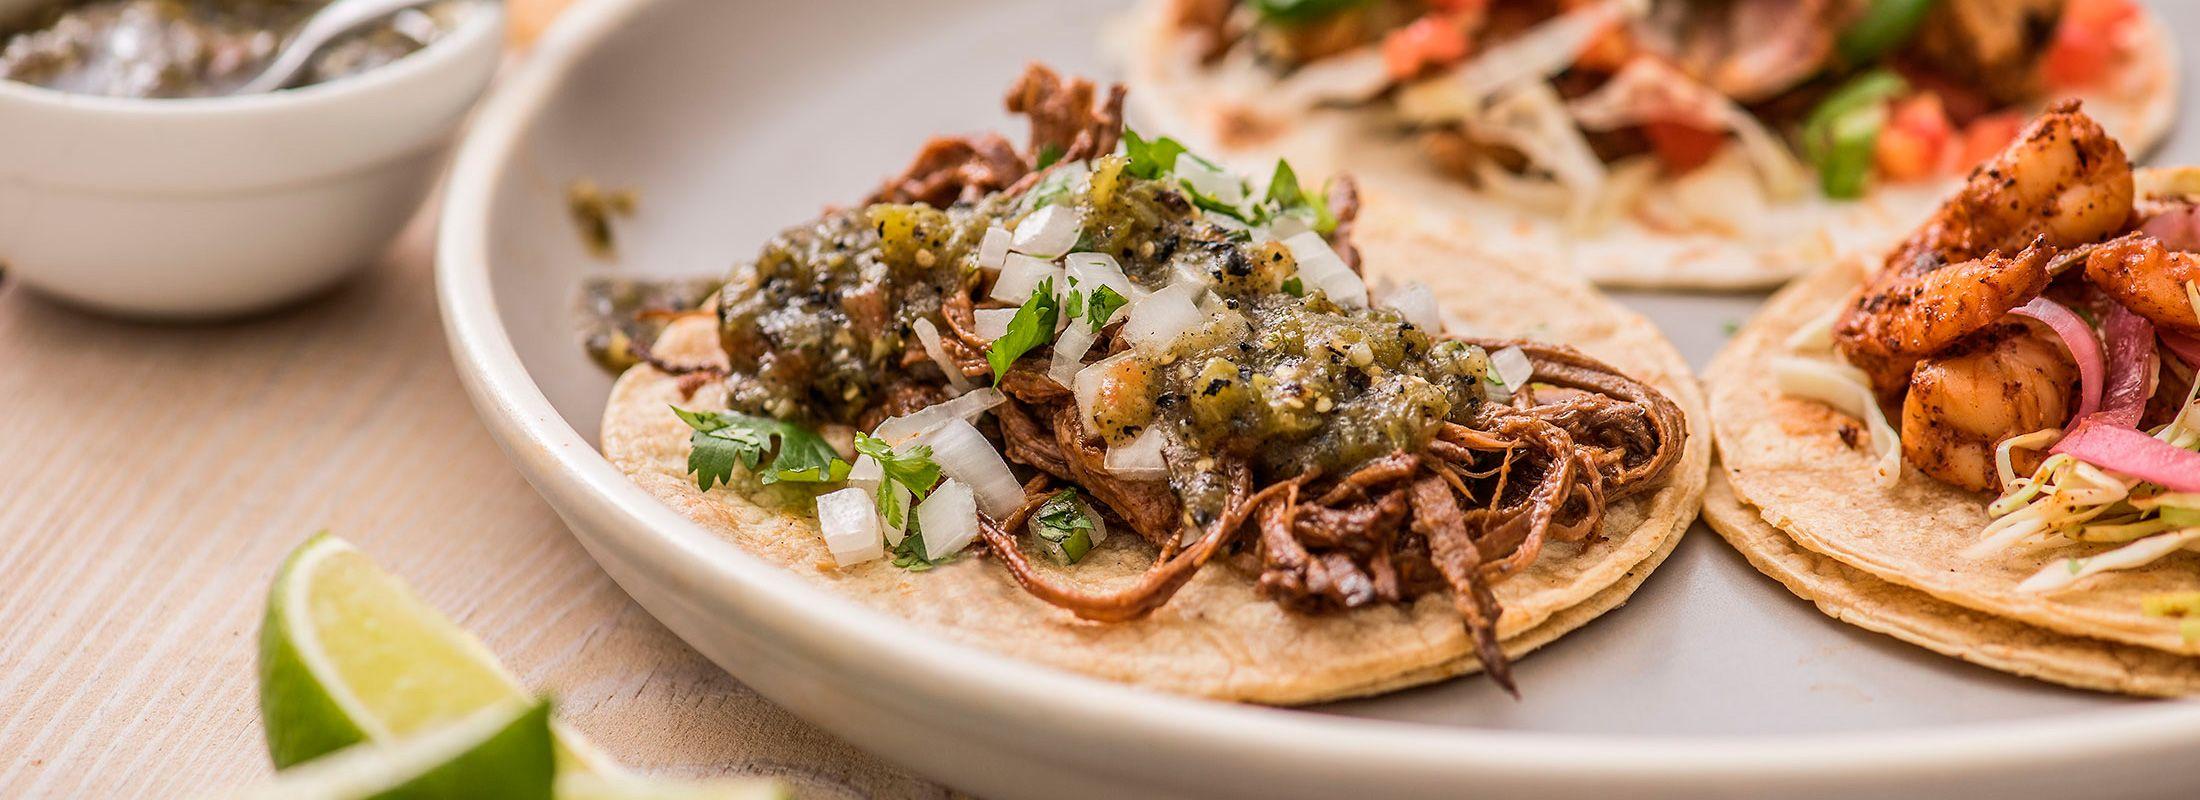 Burrito beach chicago mexican food recipes fresh food